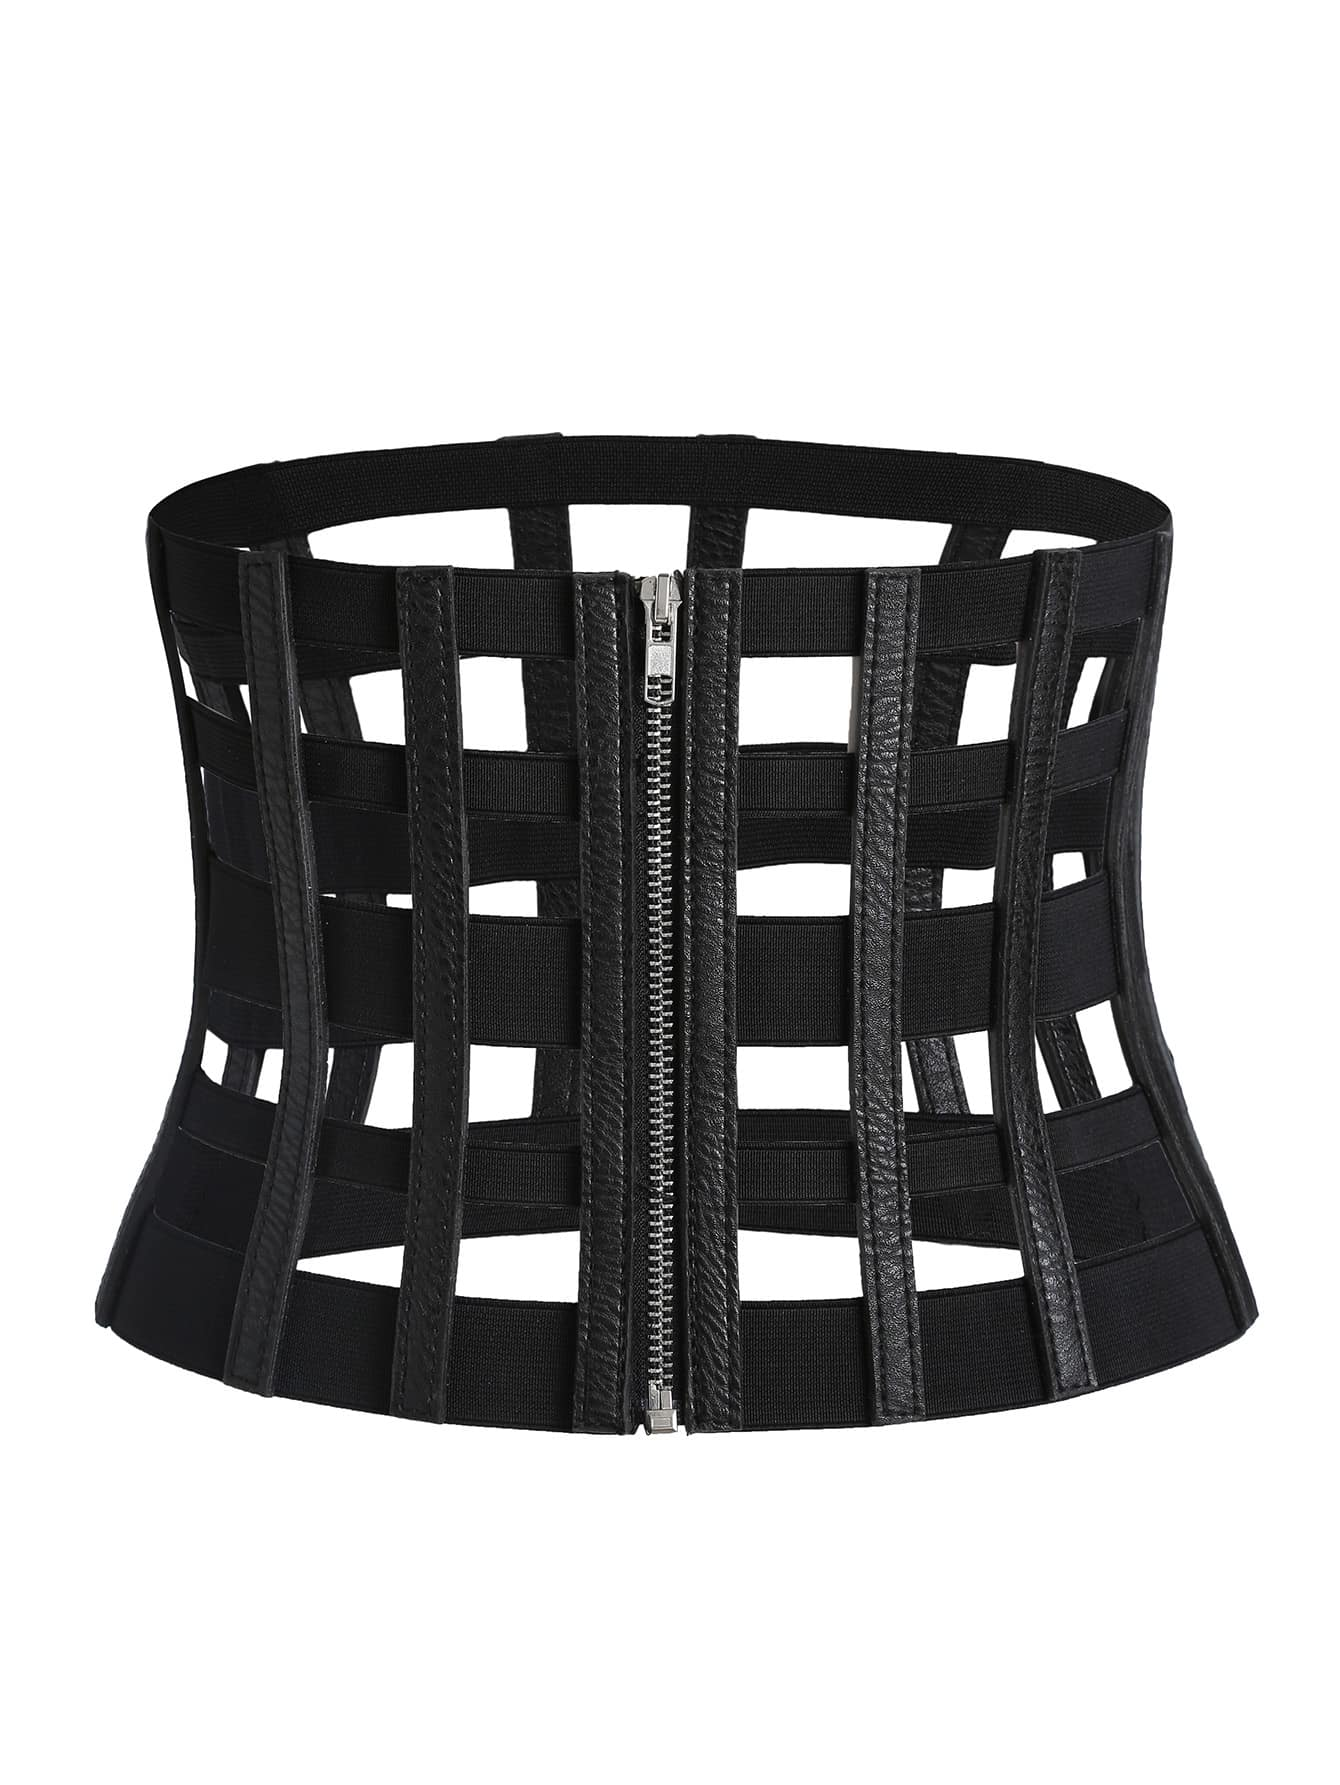 Фото Black Cutout Zipper Corset Belt. Купить с доставкой